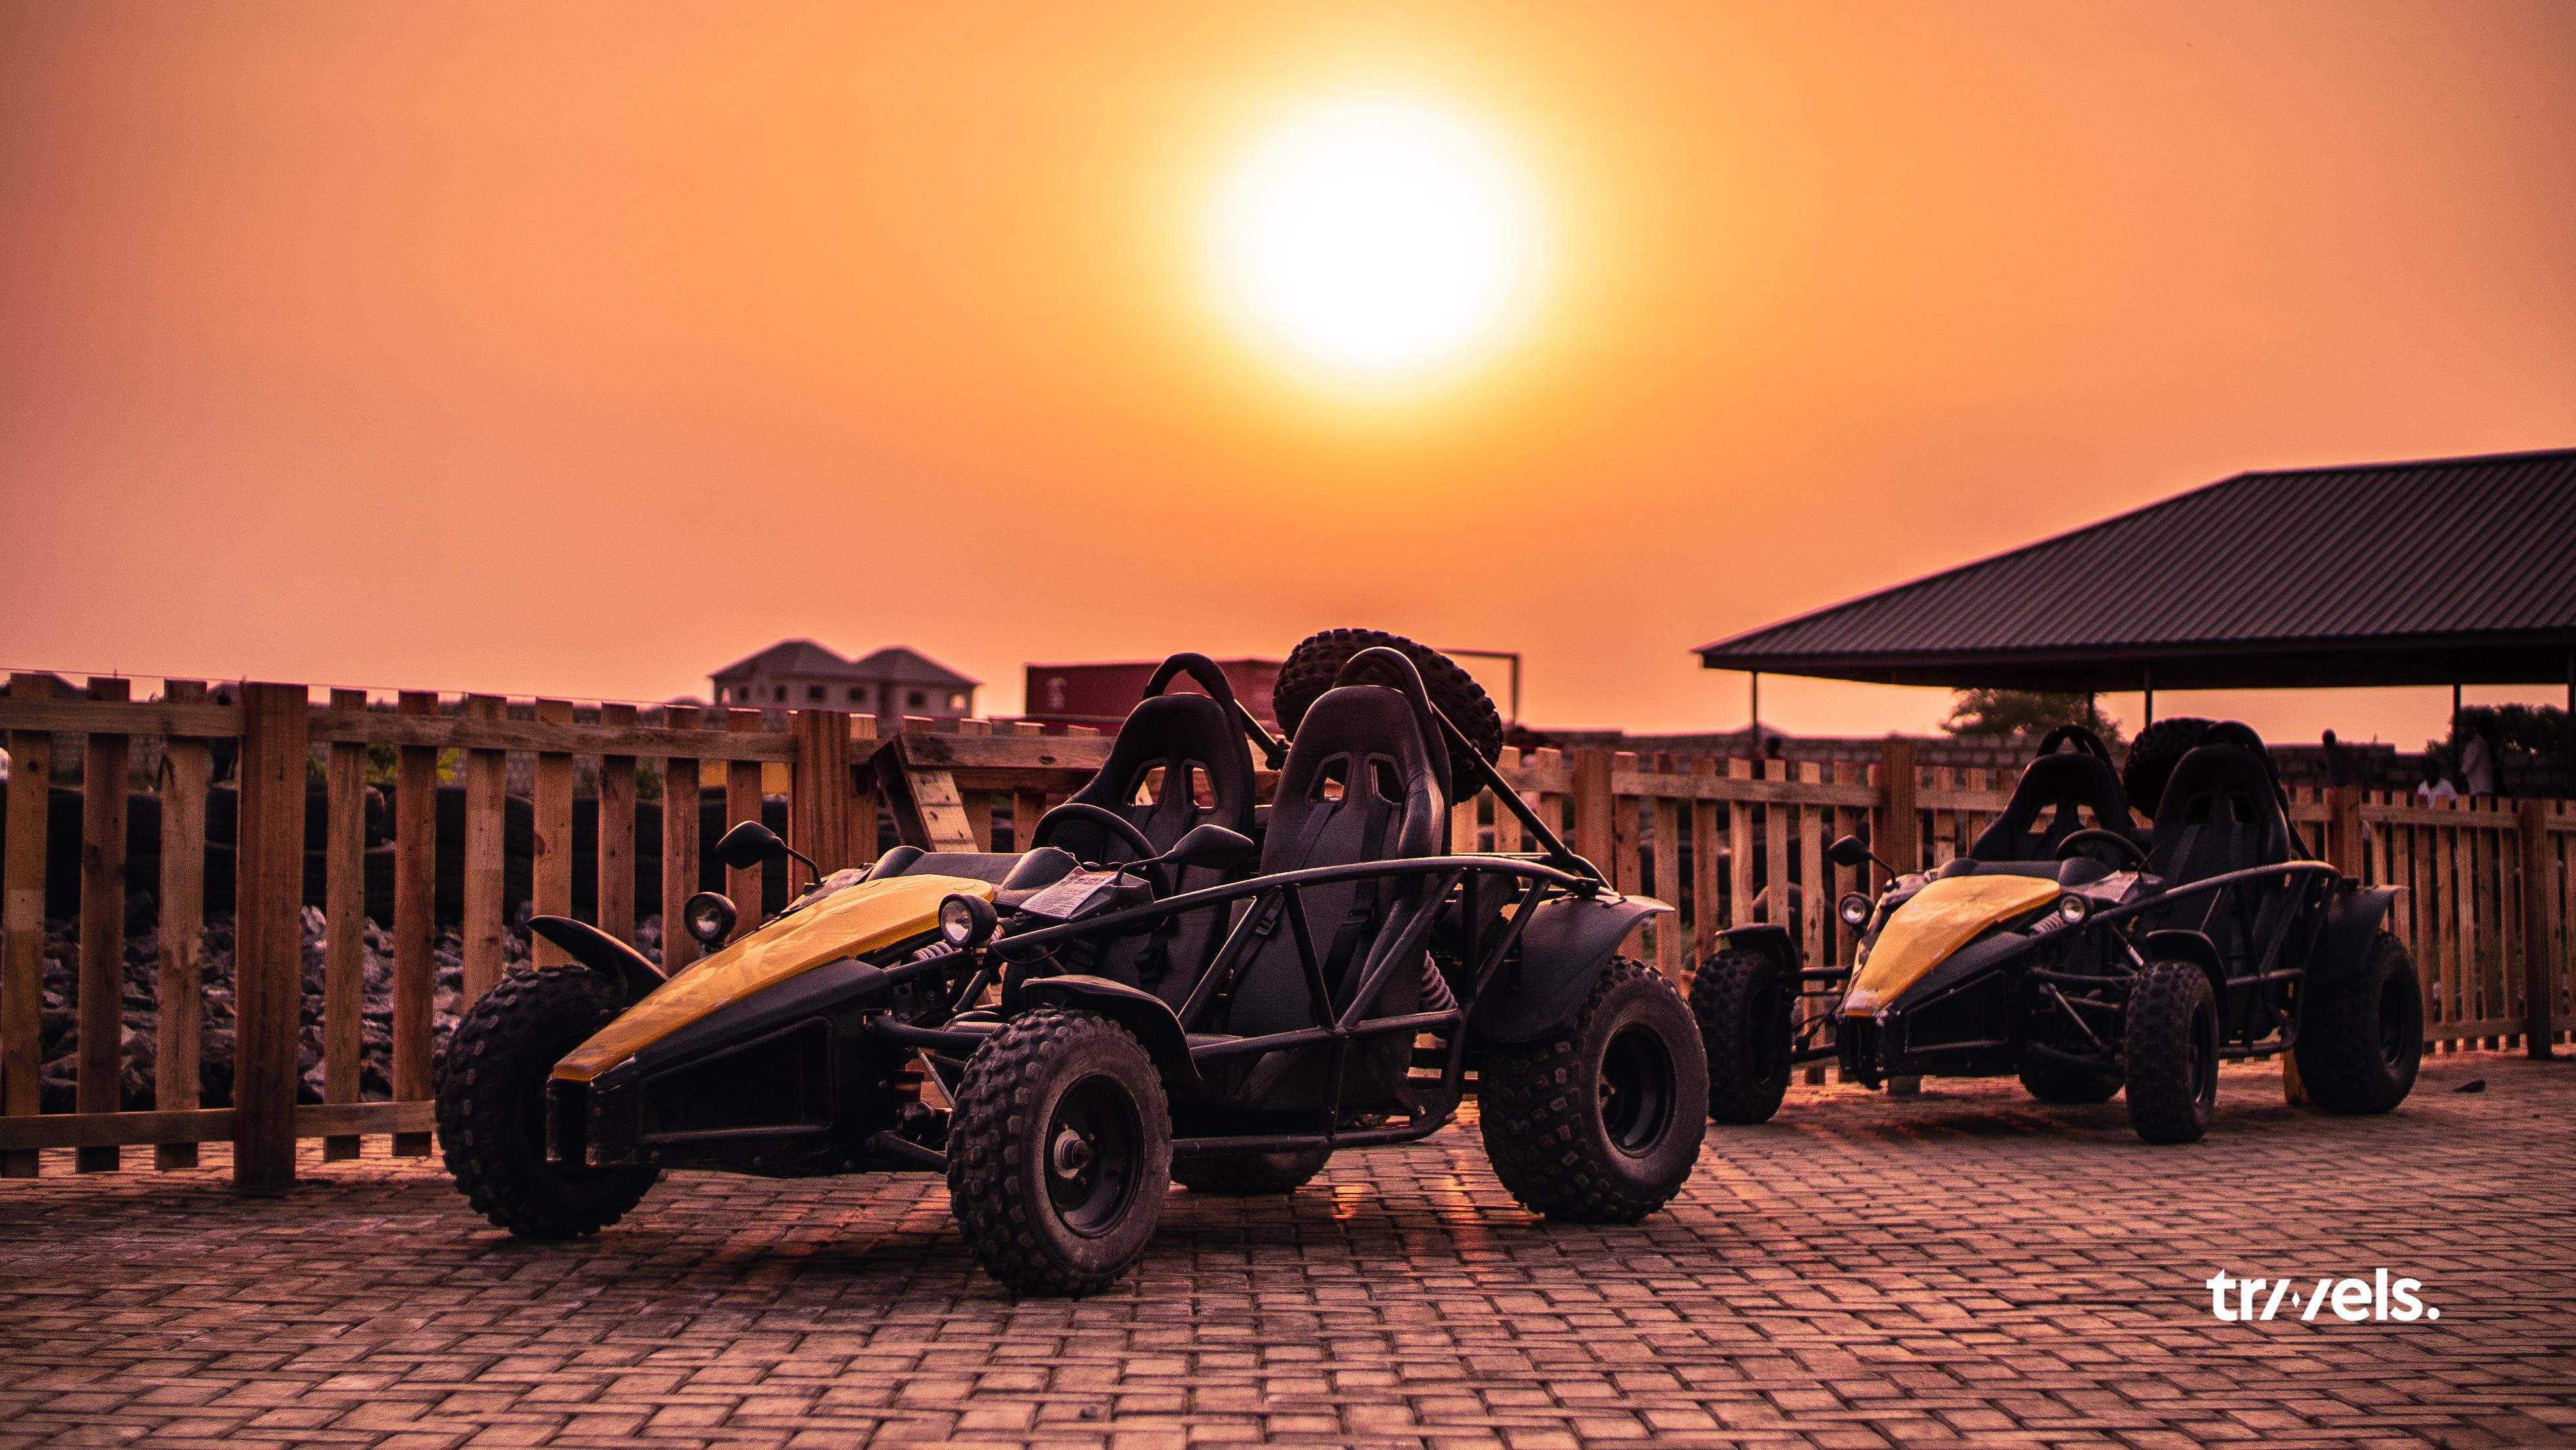 All-terrain vehicles at Deon Recreational Centre via Travels Ghana